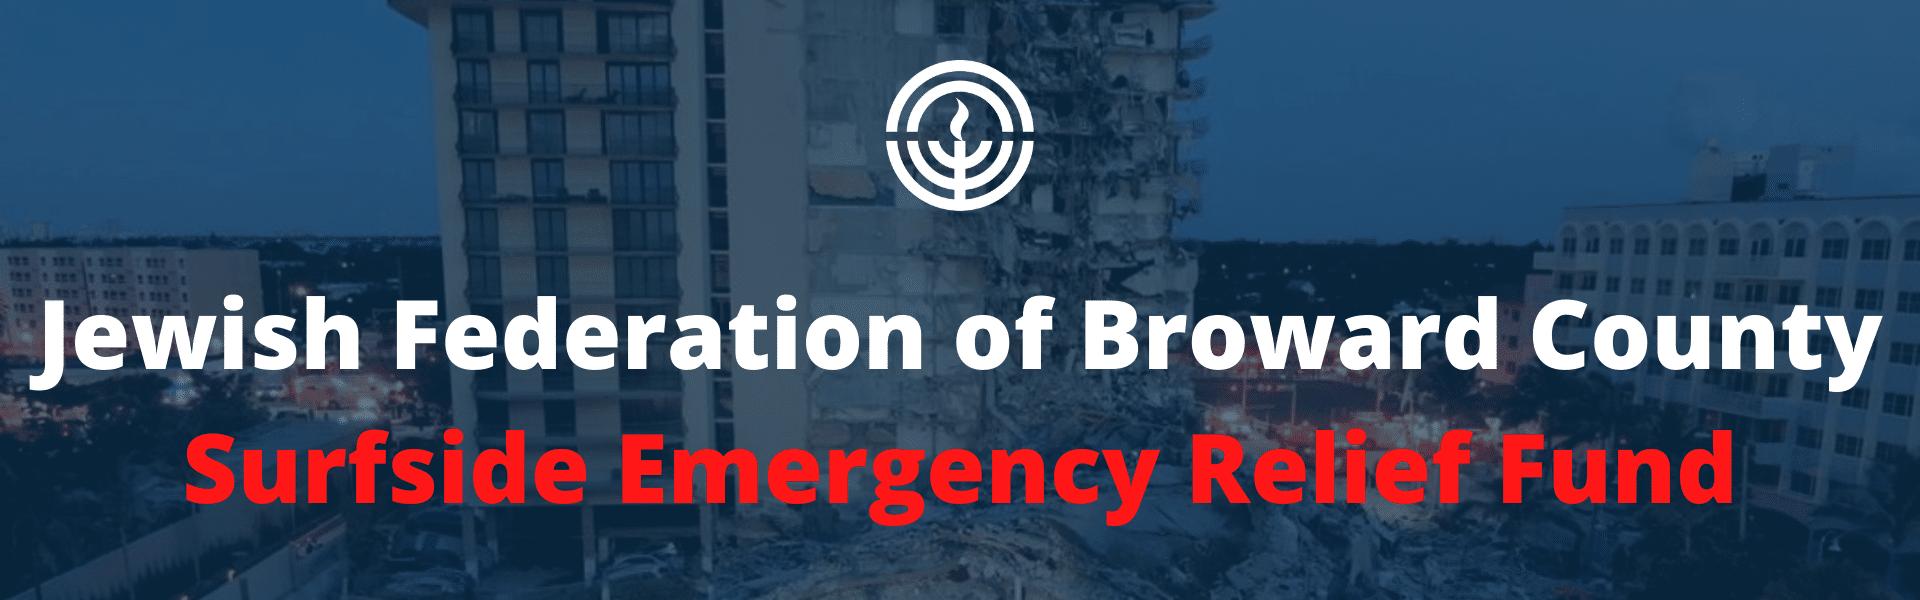 Jewish Federation Of Broward County Surfside Emergency Relief Fund